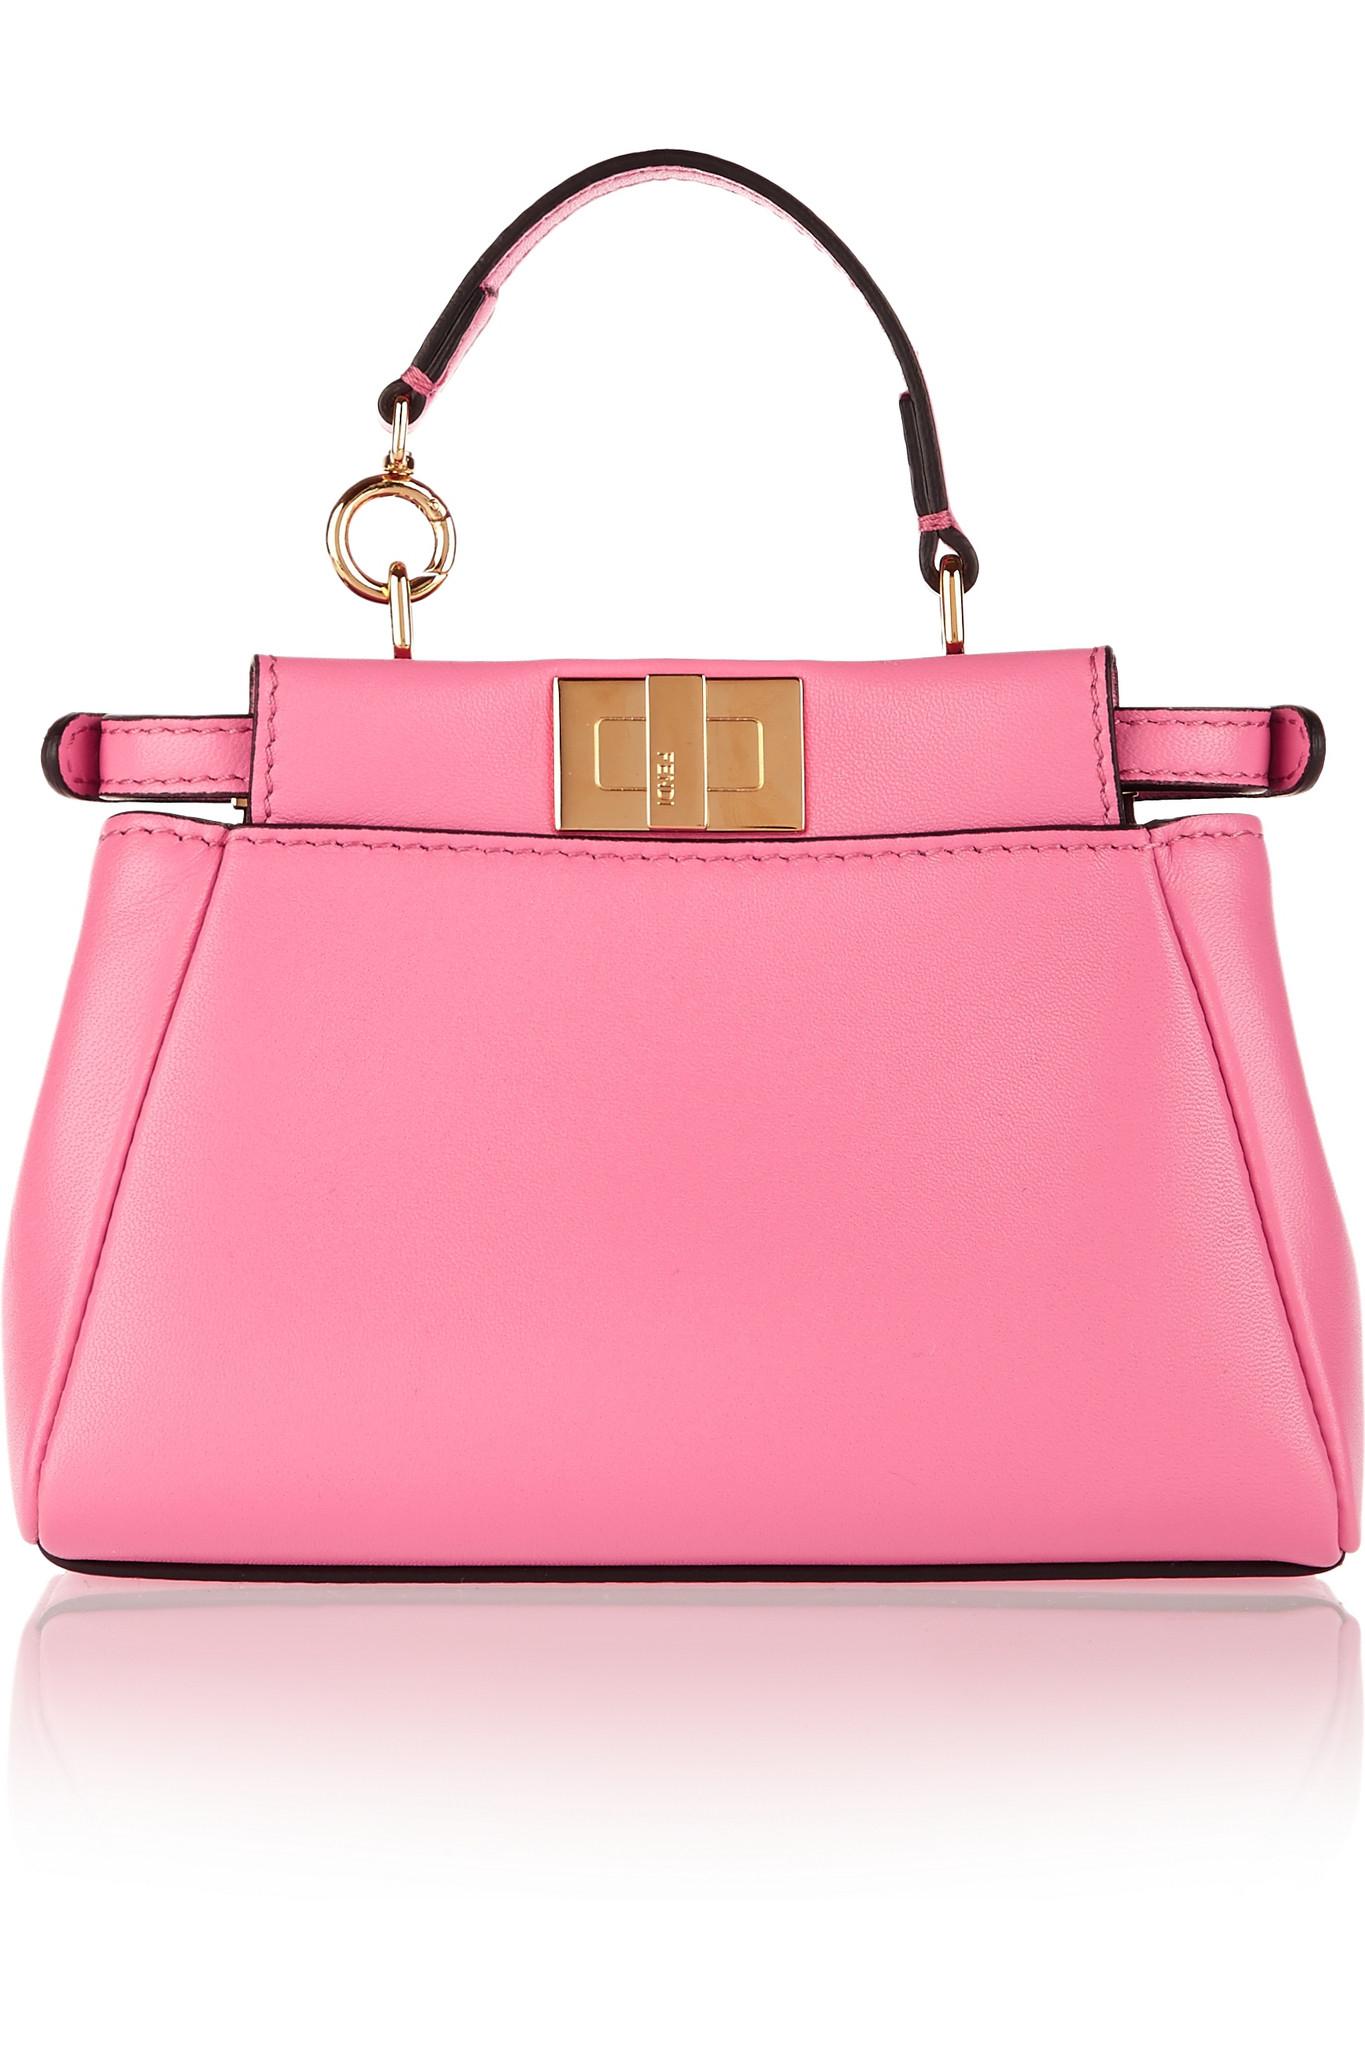 cb24ec39b25 Fendi Peekaboo Micro Leather Shoulder Bag in Pink - Lyst